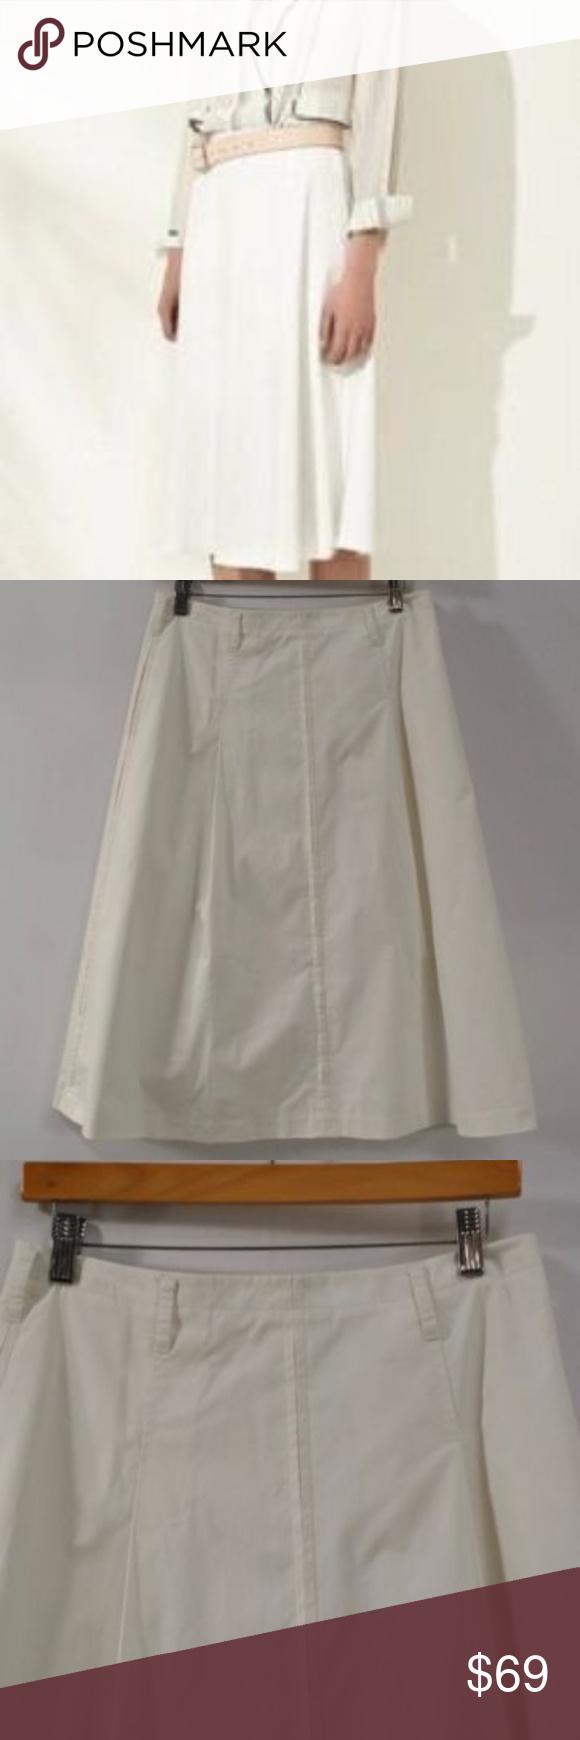 1a1a4a4193 3.1 Phillip Lim Umbrella Box Pleat Skirt ANT-White SIZE - 4 MAIN COLOR -